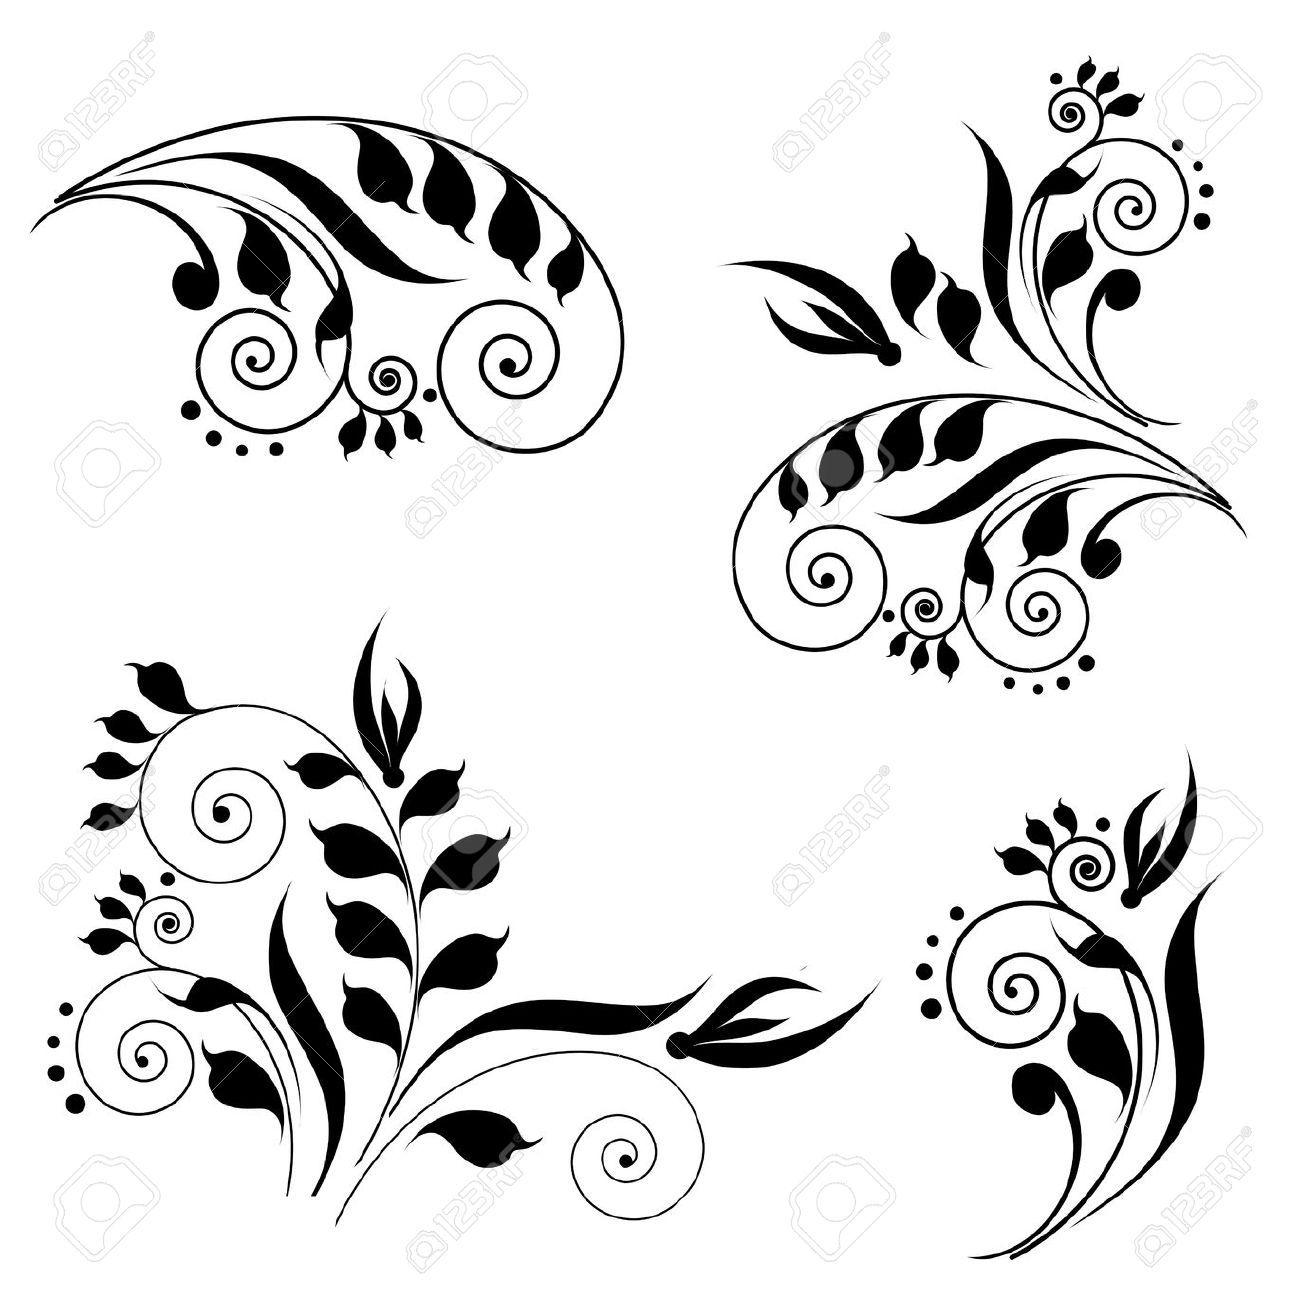 Flower design stock vector illustration and royalty free flower flower design stock vector illustration and royalty free flower junglespirit Images